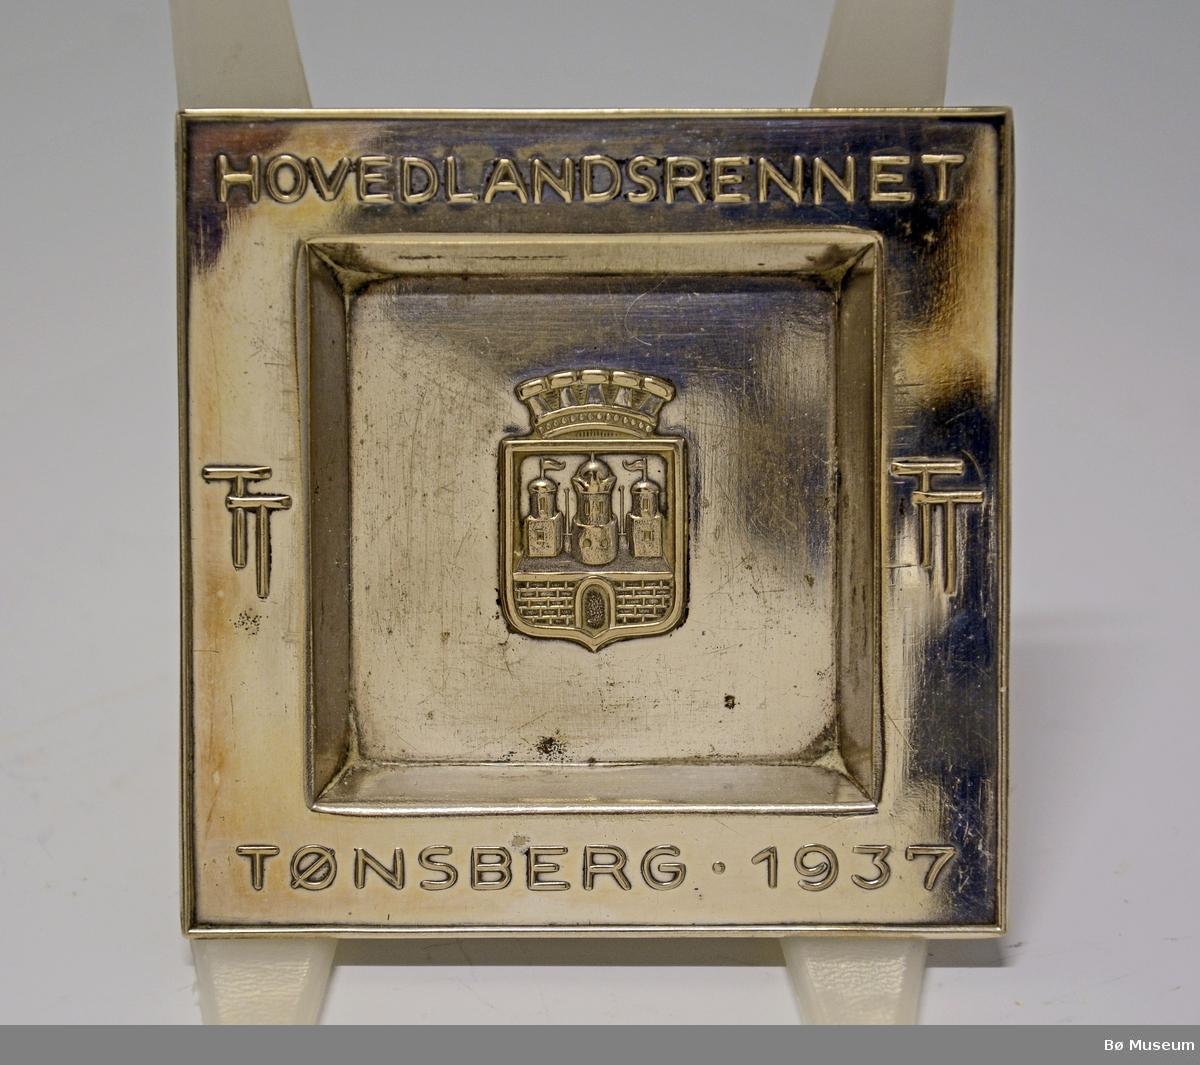 "Liten, firkantet sølvskål med innskrift: ""HOVEDLANDSRENNET - TØNSBERG 1937"" Tønsbergs byvåpen. Uten stempel - ikke sølv."